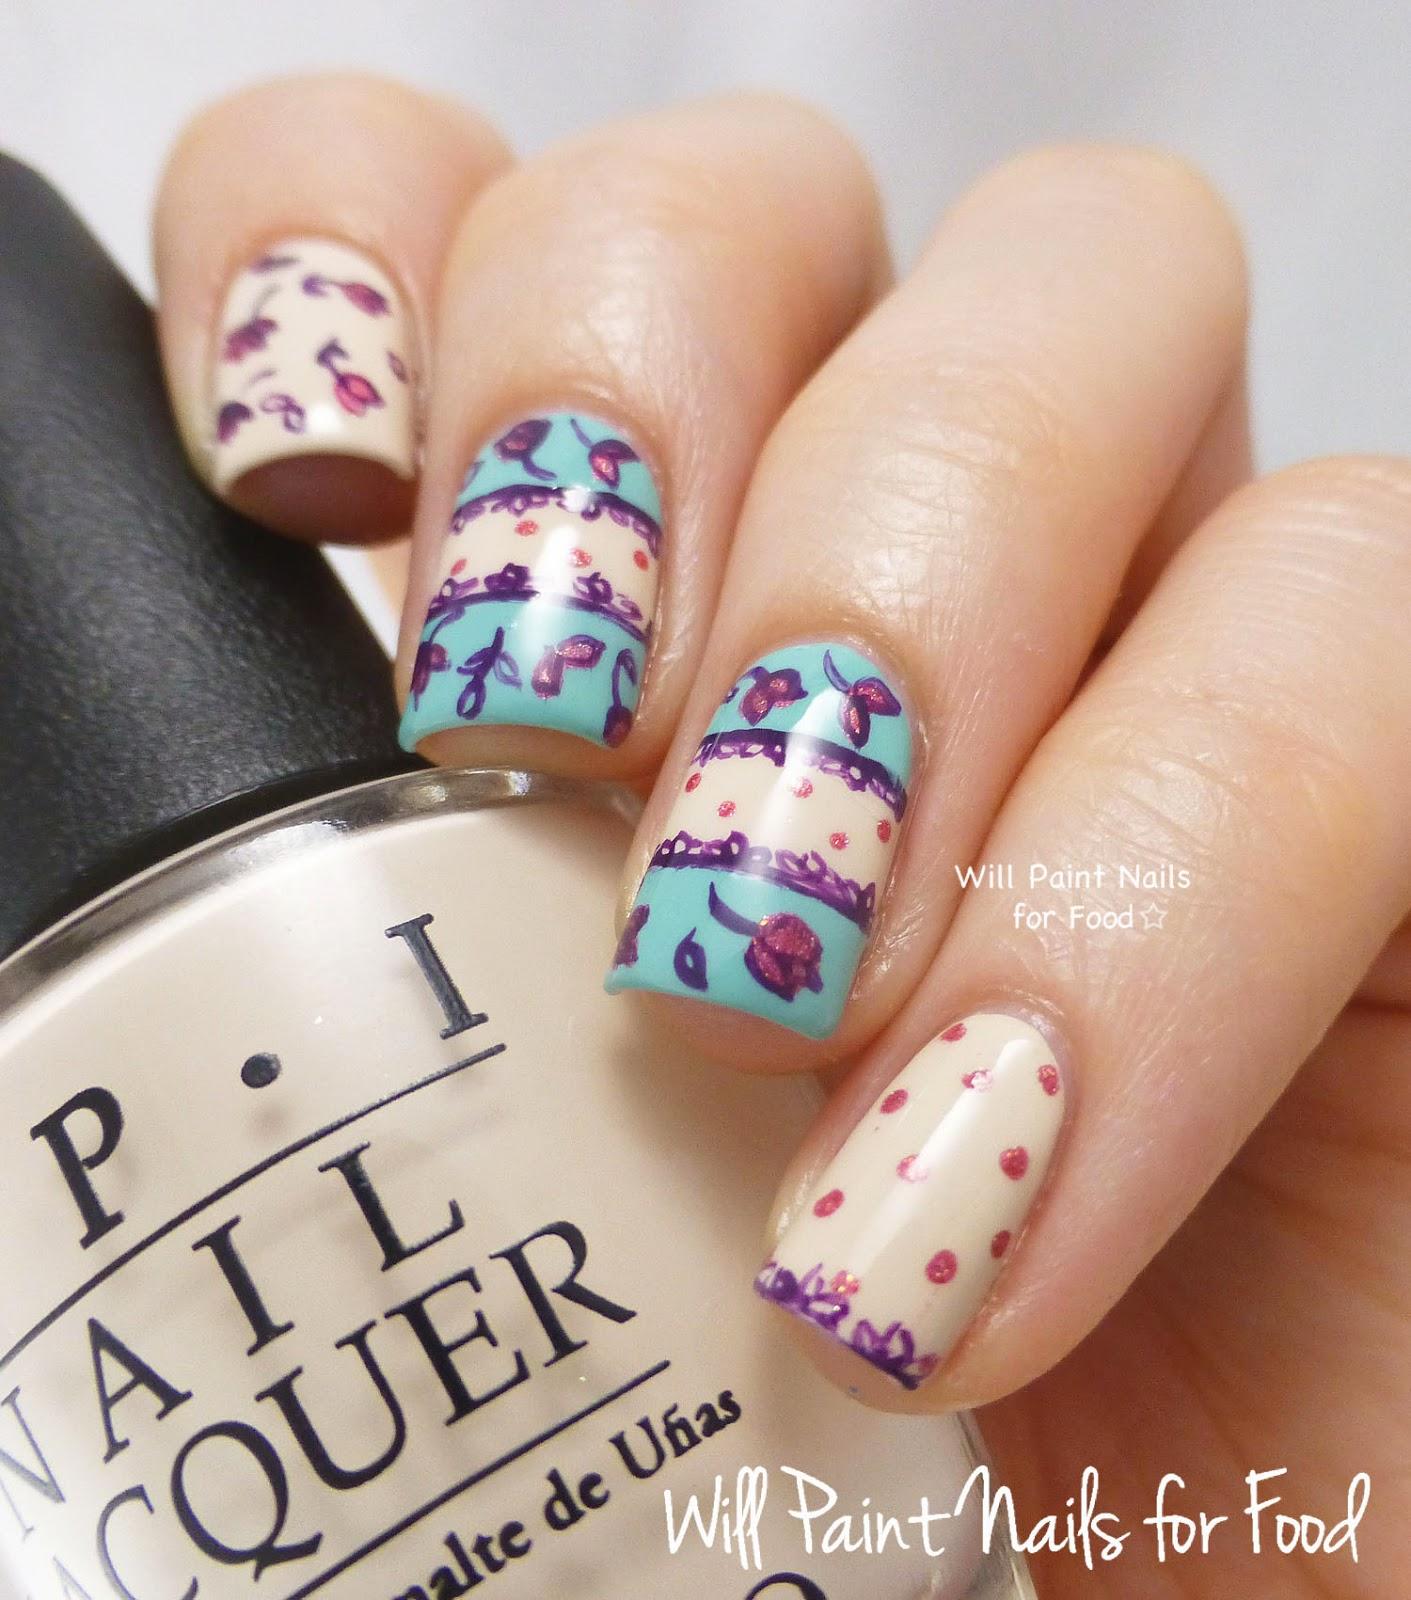 Cute Vintage Nail Designs Gorgeous Vintage Inspired Nail Art Ideas